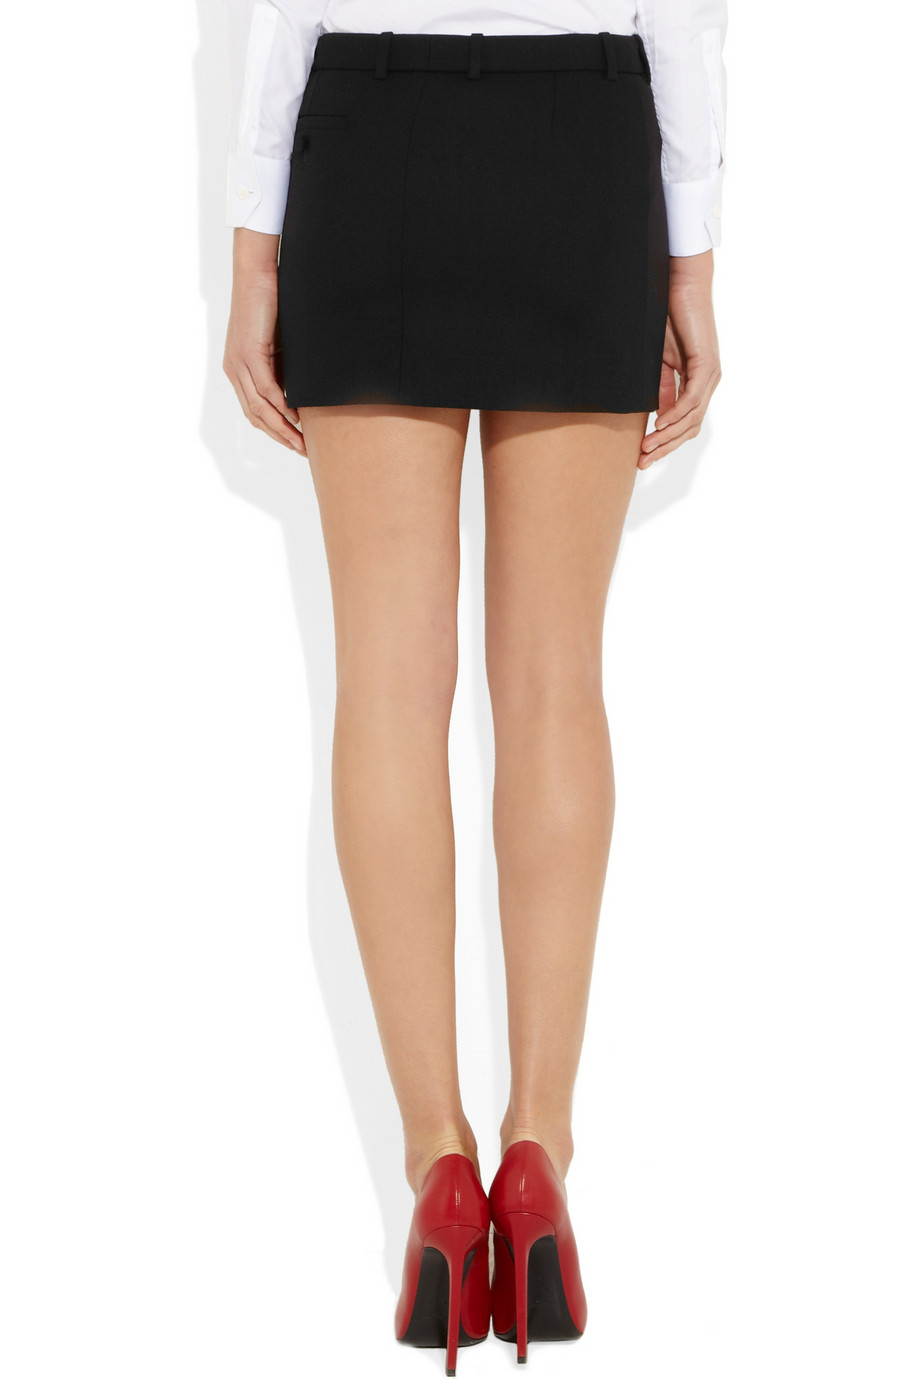 Saint laurent Wool Mini Skirt in Black | Lyst